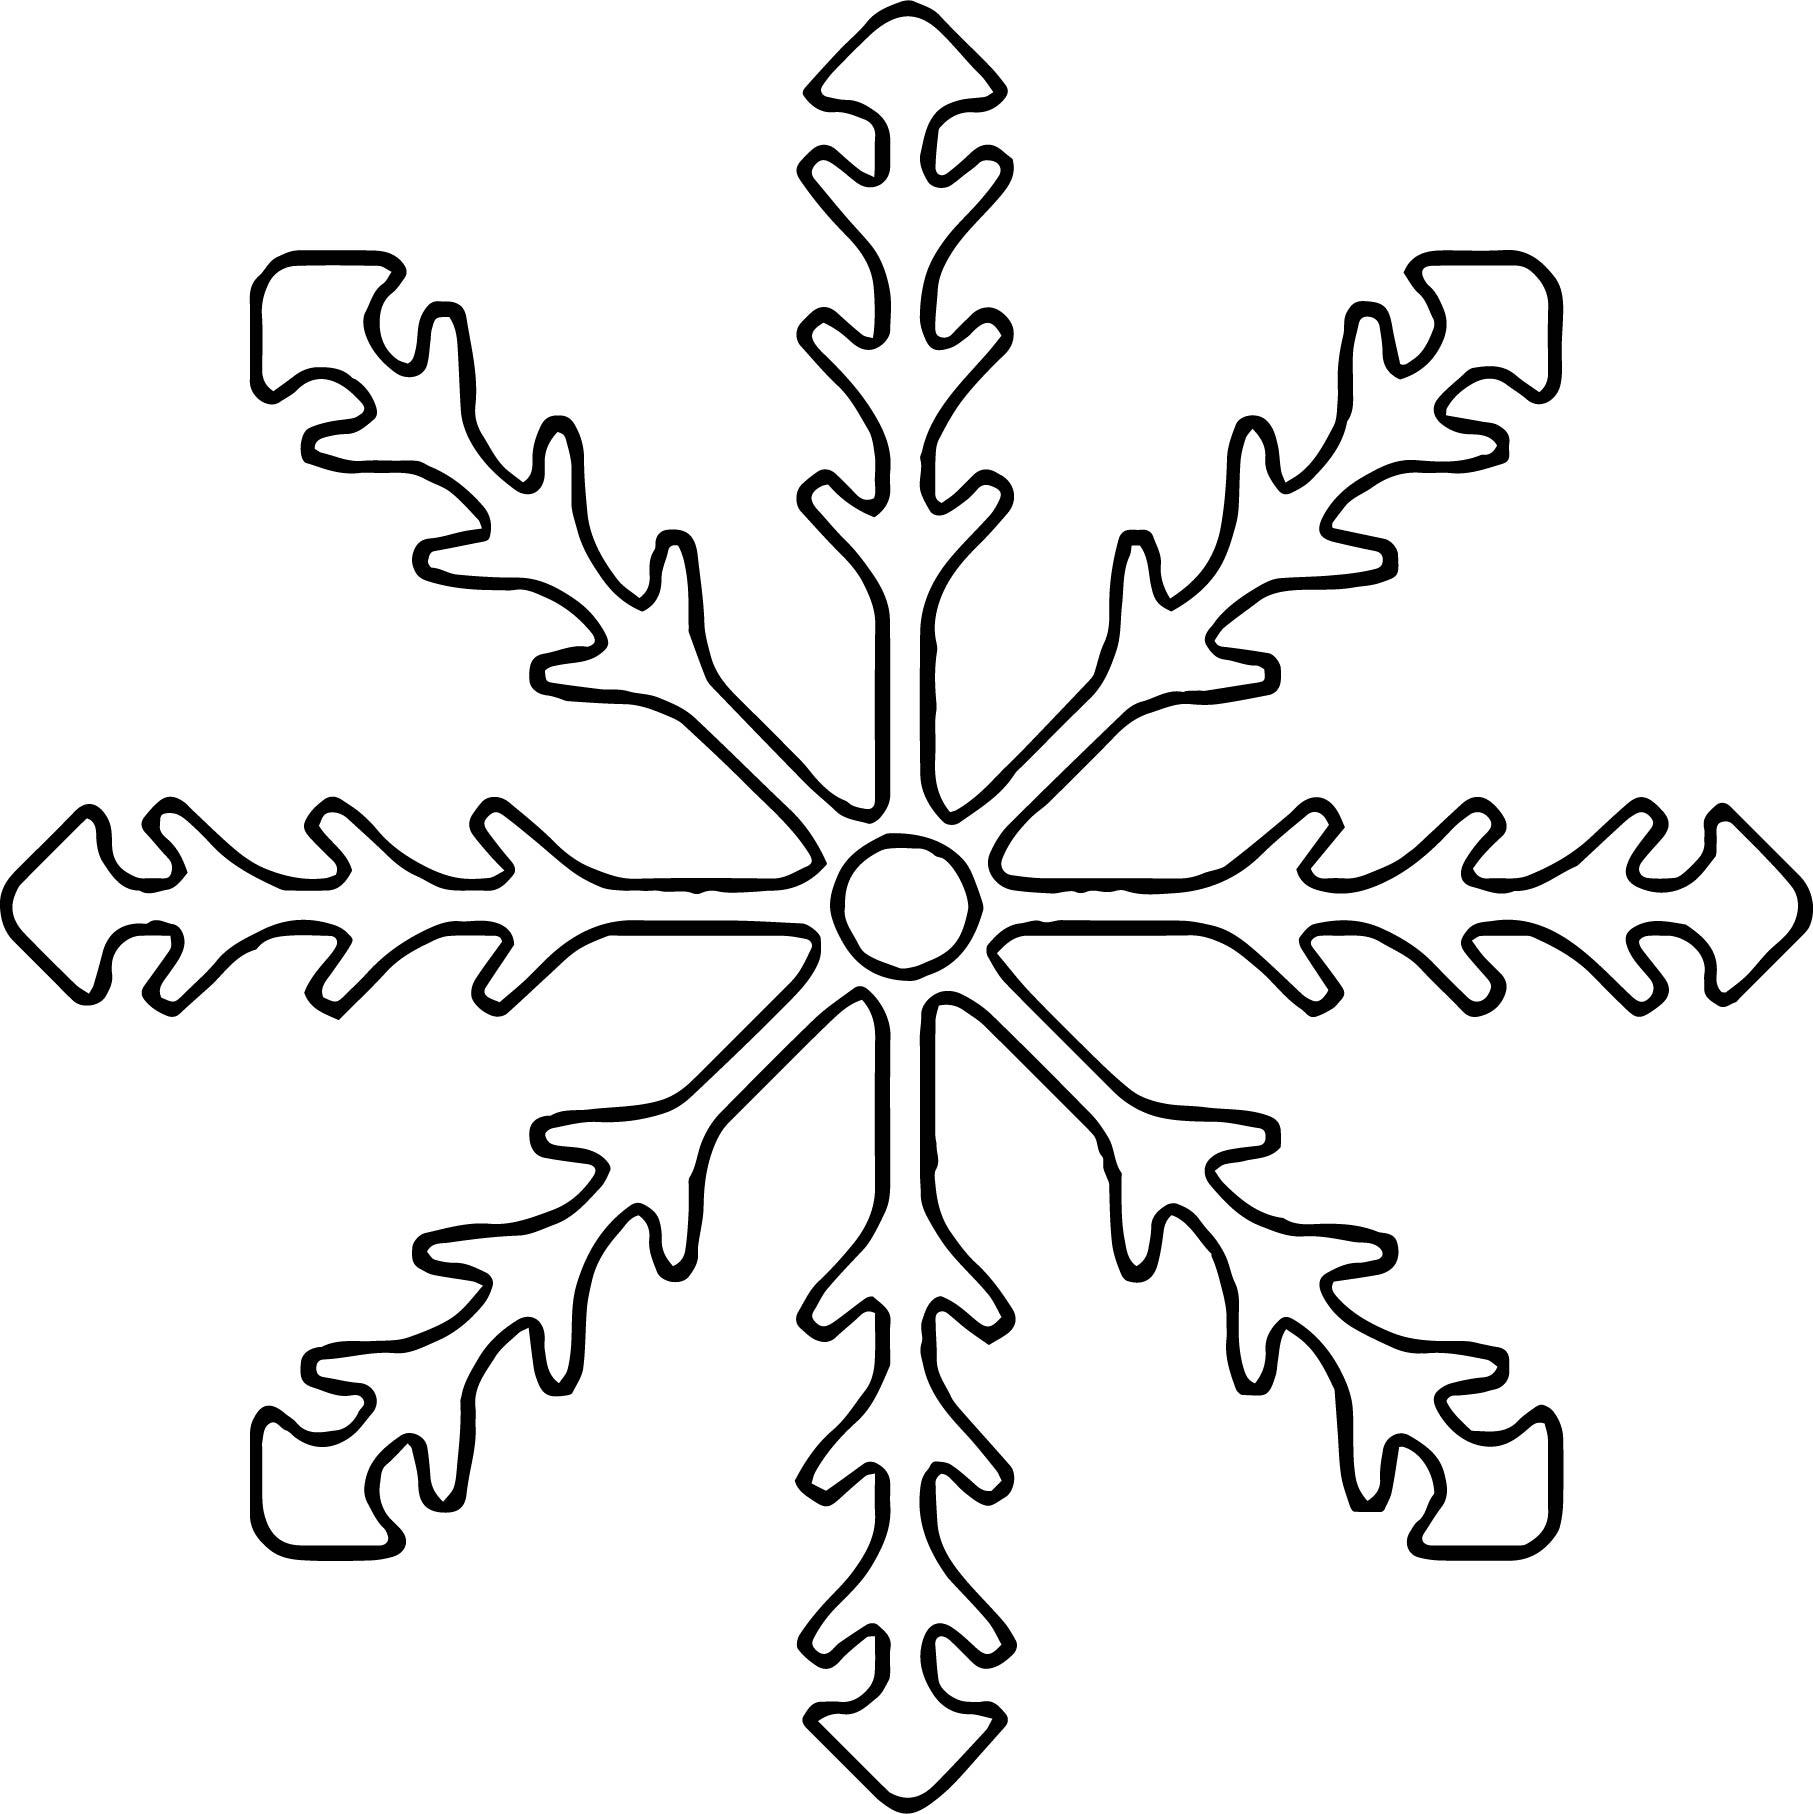 Snowflake Coloring Page WeColoringPage 25 | Wecoloringpage.com